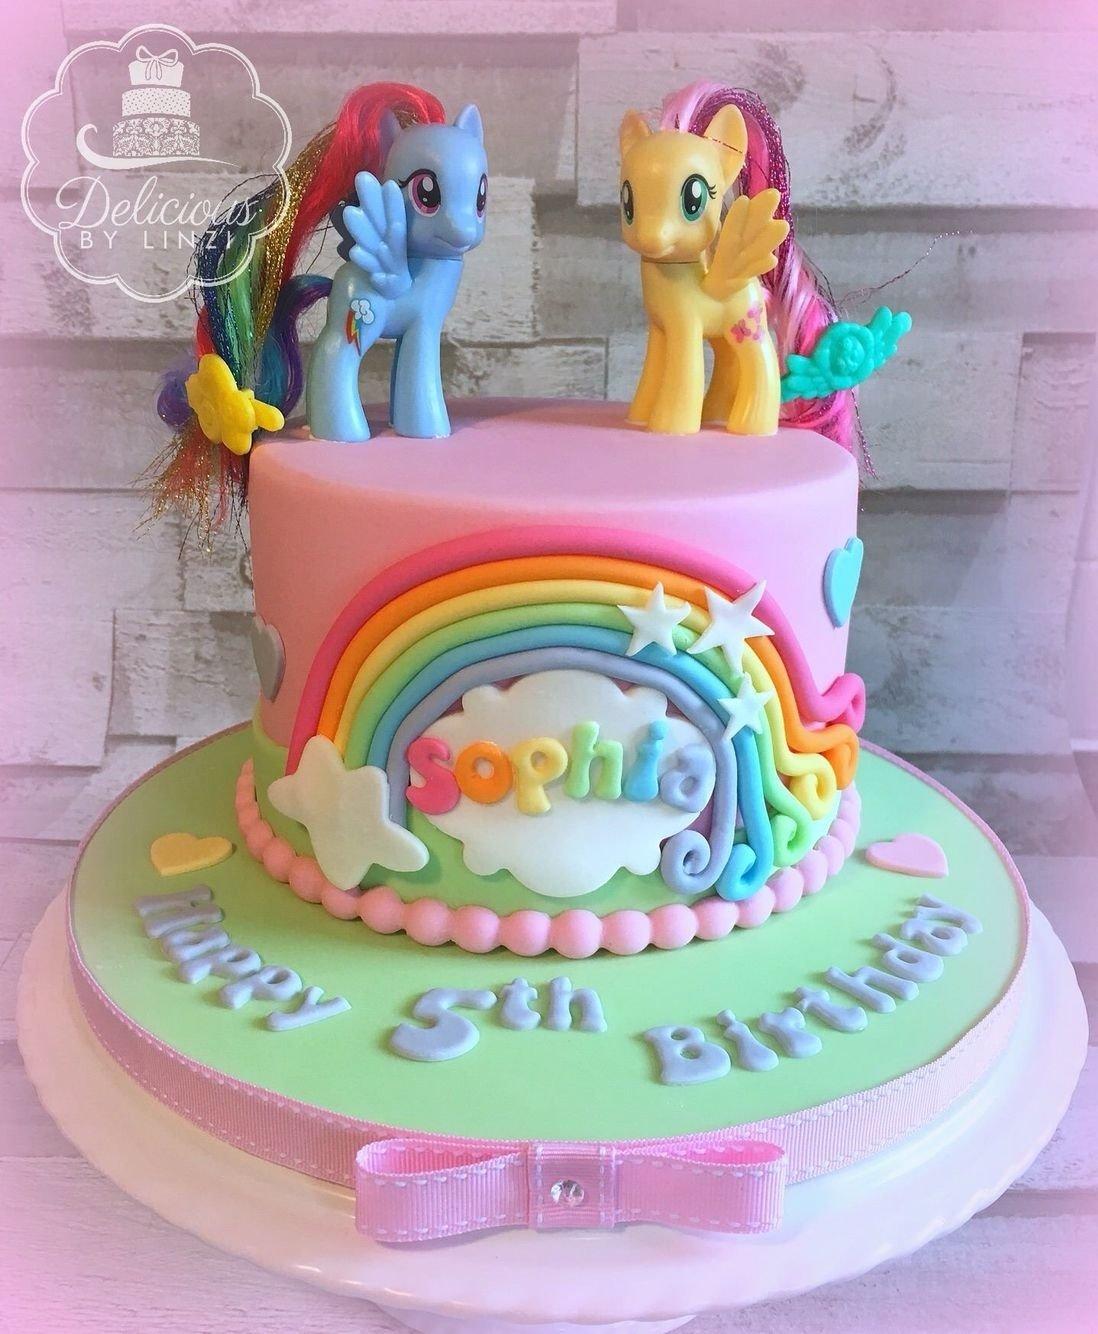 10 Elegant My Little Pony Cake Ideas pastel my little pony birthday cake www deliciousbylinzi co uk